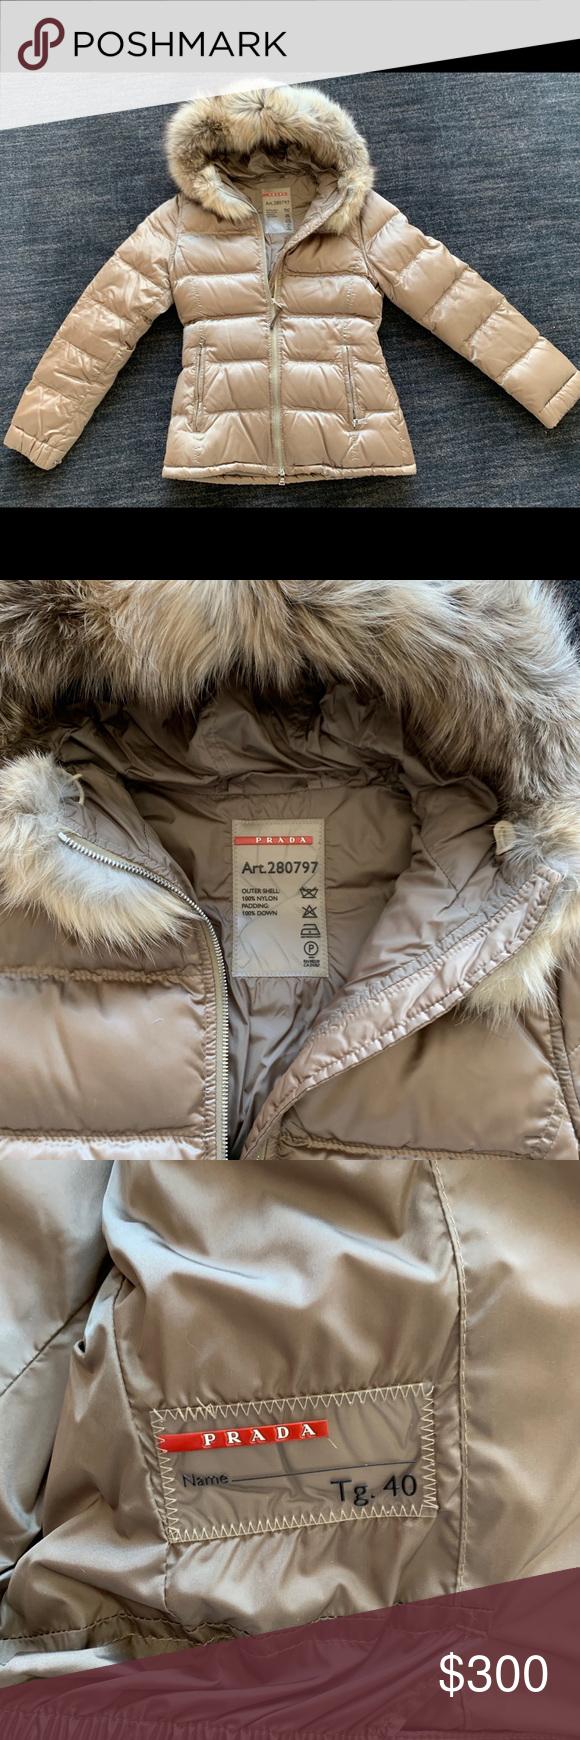 Prada Sateen Puffer Jacket With Fur Trim Hood Puffer Jacket With Fur Fur Trim Puffer Jackets [ 1740 x 580 Pixel ]